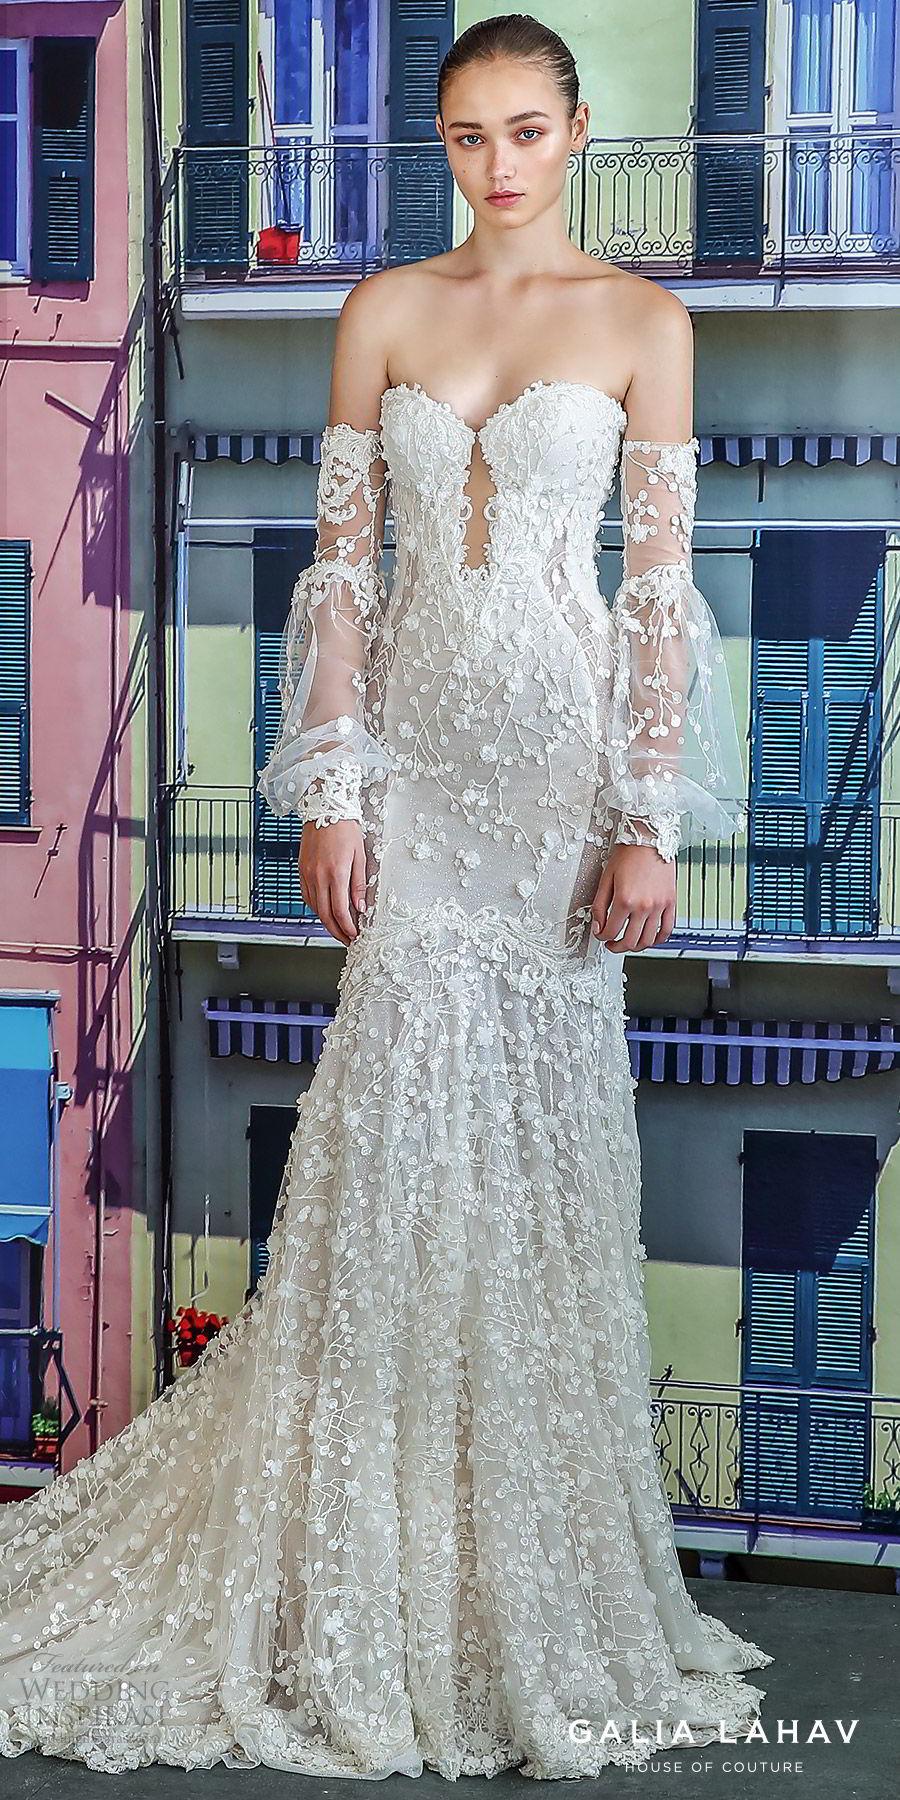 galia lahav fall 2019 bridal detached illusion bell sleeves sweetheart keyhole bodice fully embroidered lace mermaid wedding dress cathedral train illusion back (camilla) lv